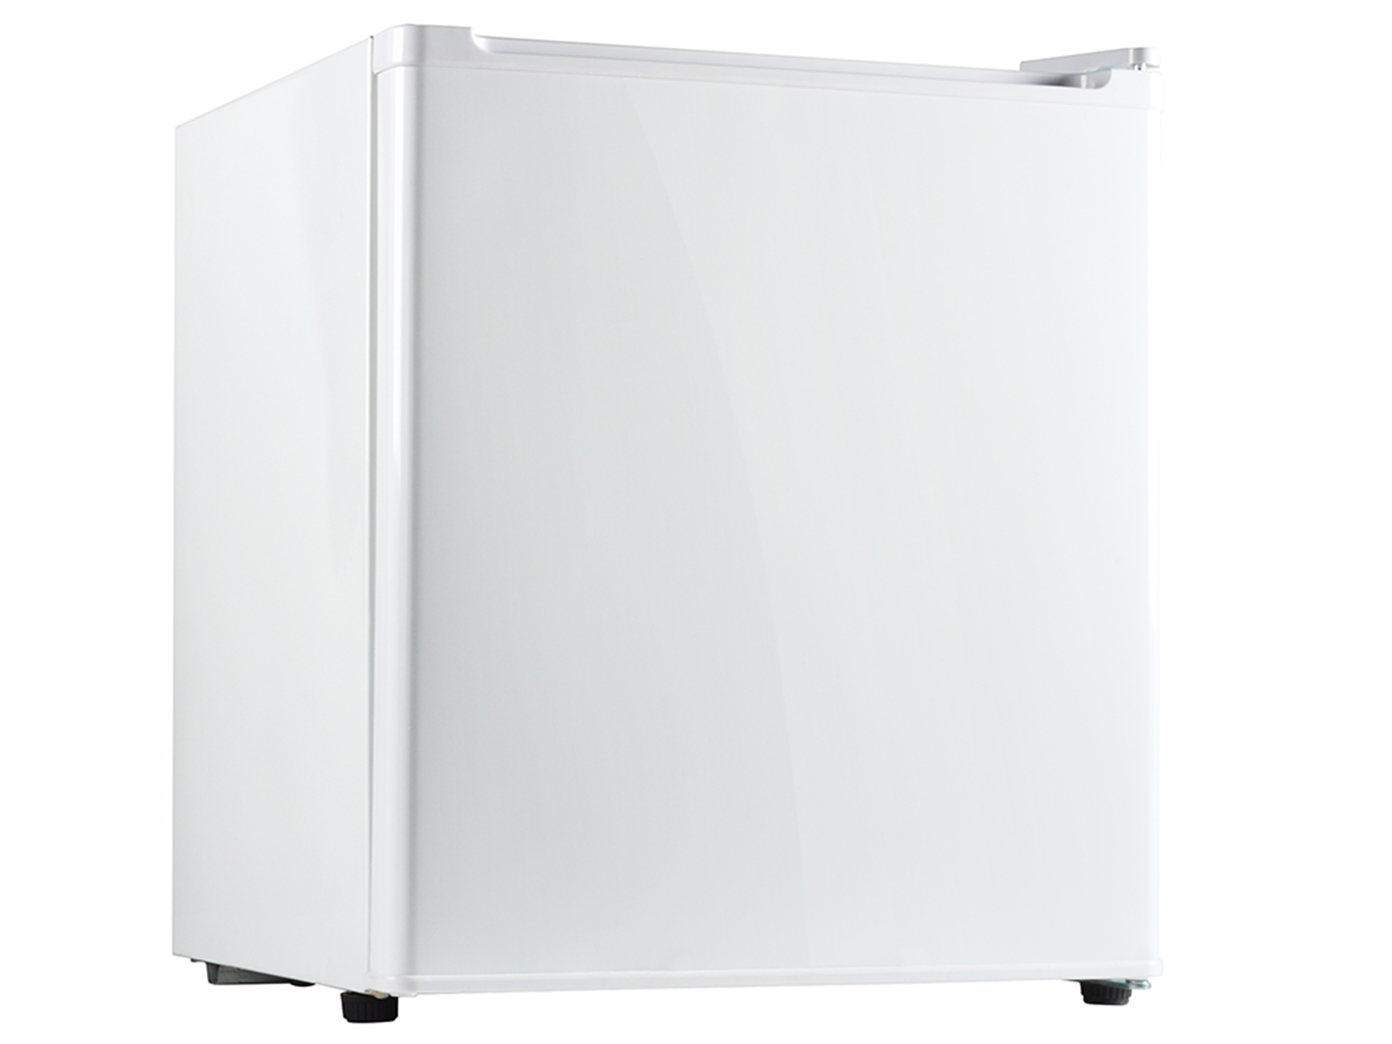 Amstyle Mini Kühlschrank Minibar Schwarz 46 L : Minibar kühlschrank mini kühlschrank liter minibar weiß real